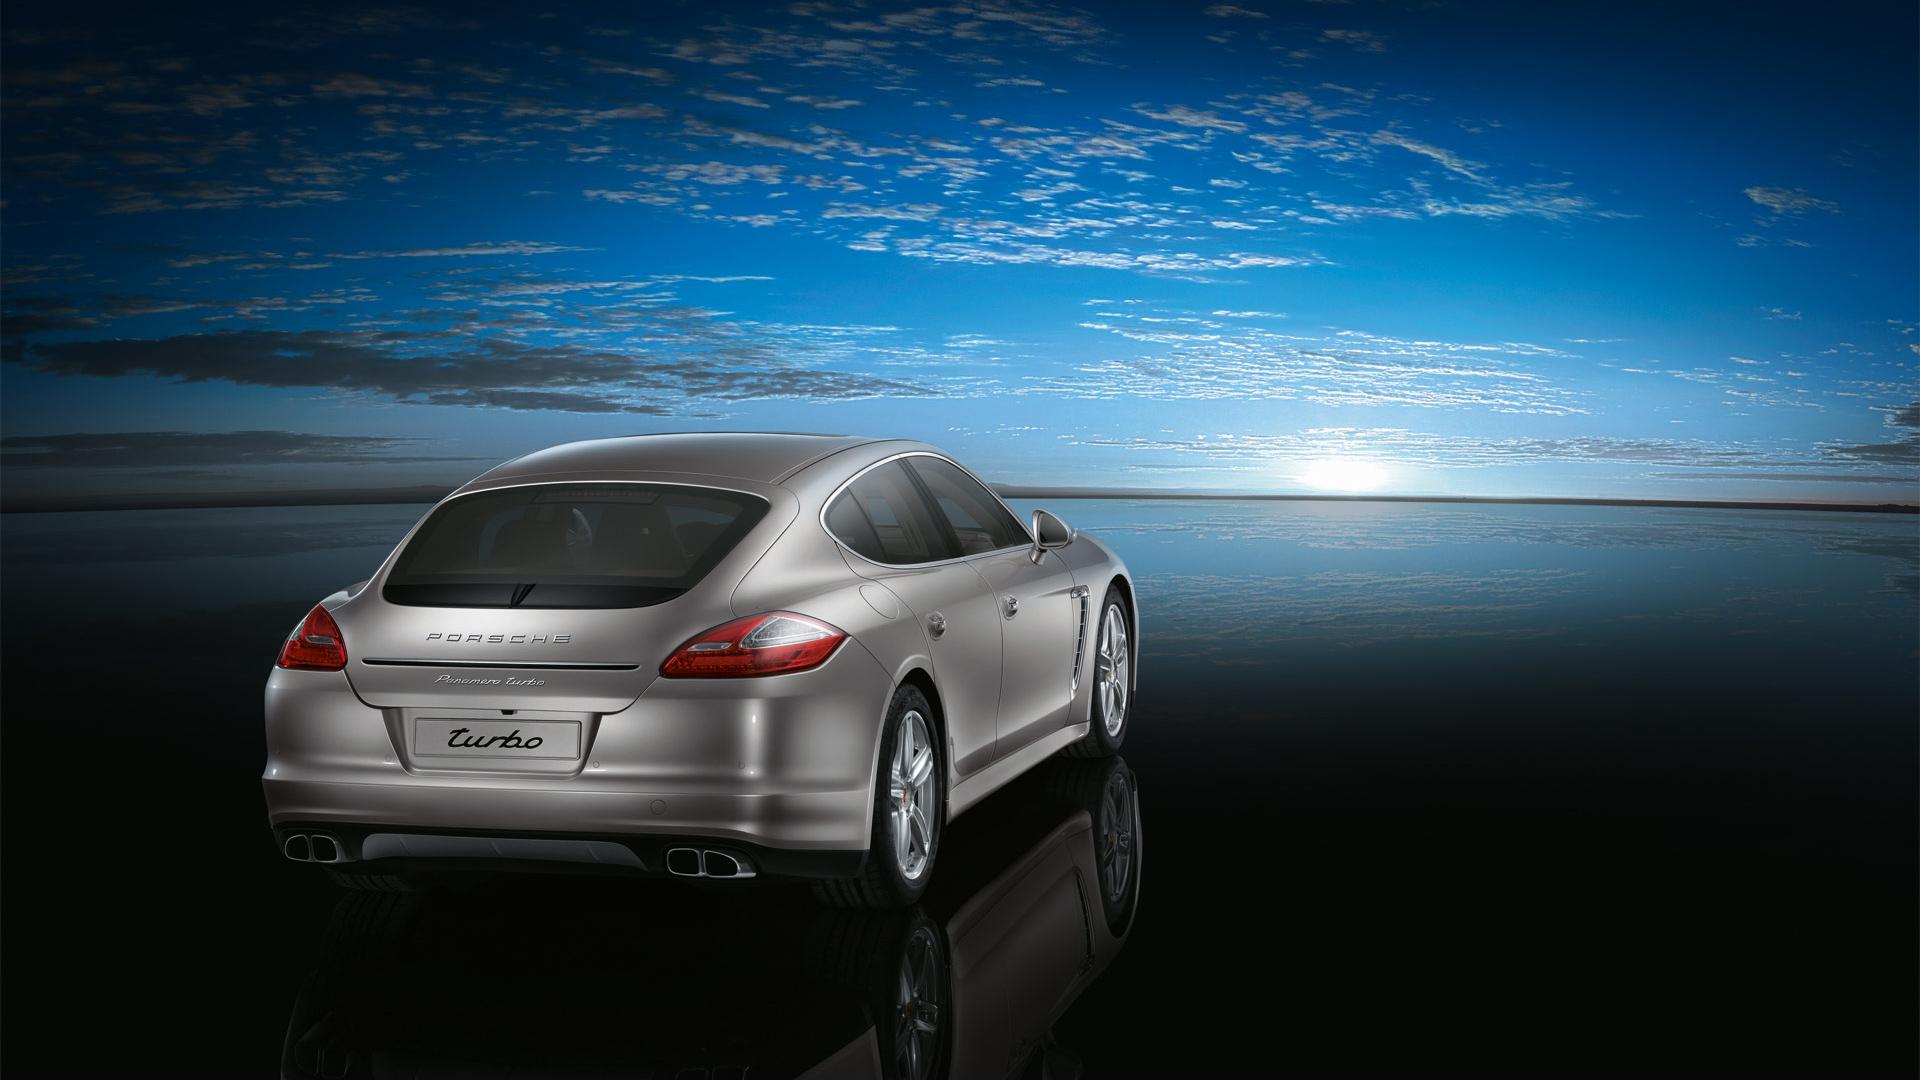 Fondo de Pantalla Porsche Panamera Turbo HD   Wallpapers HQ 1080p 1920x1080